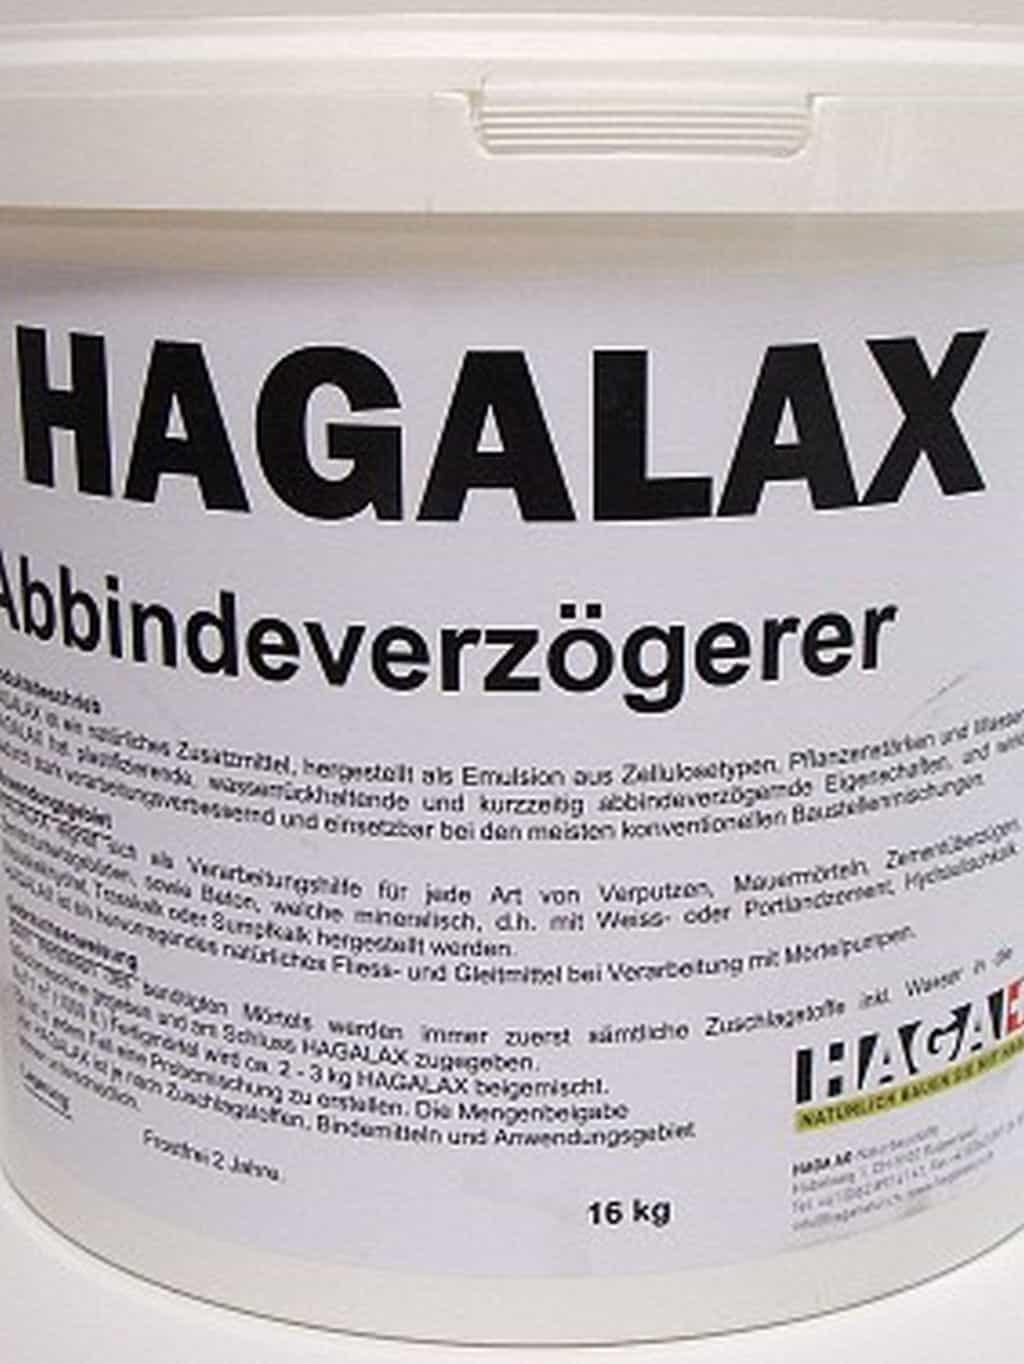 hagalax_web